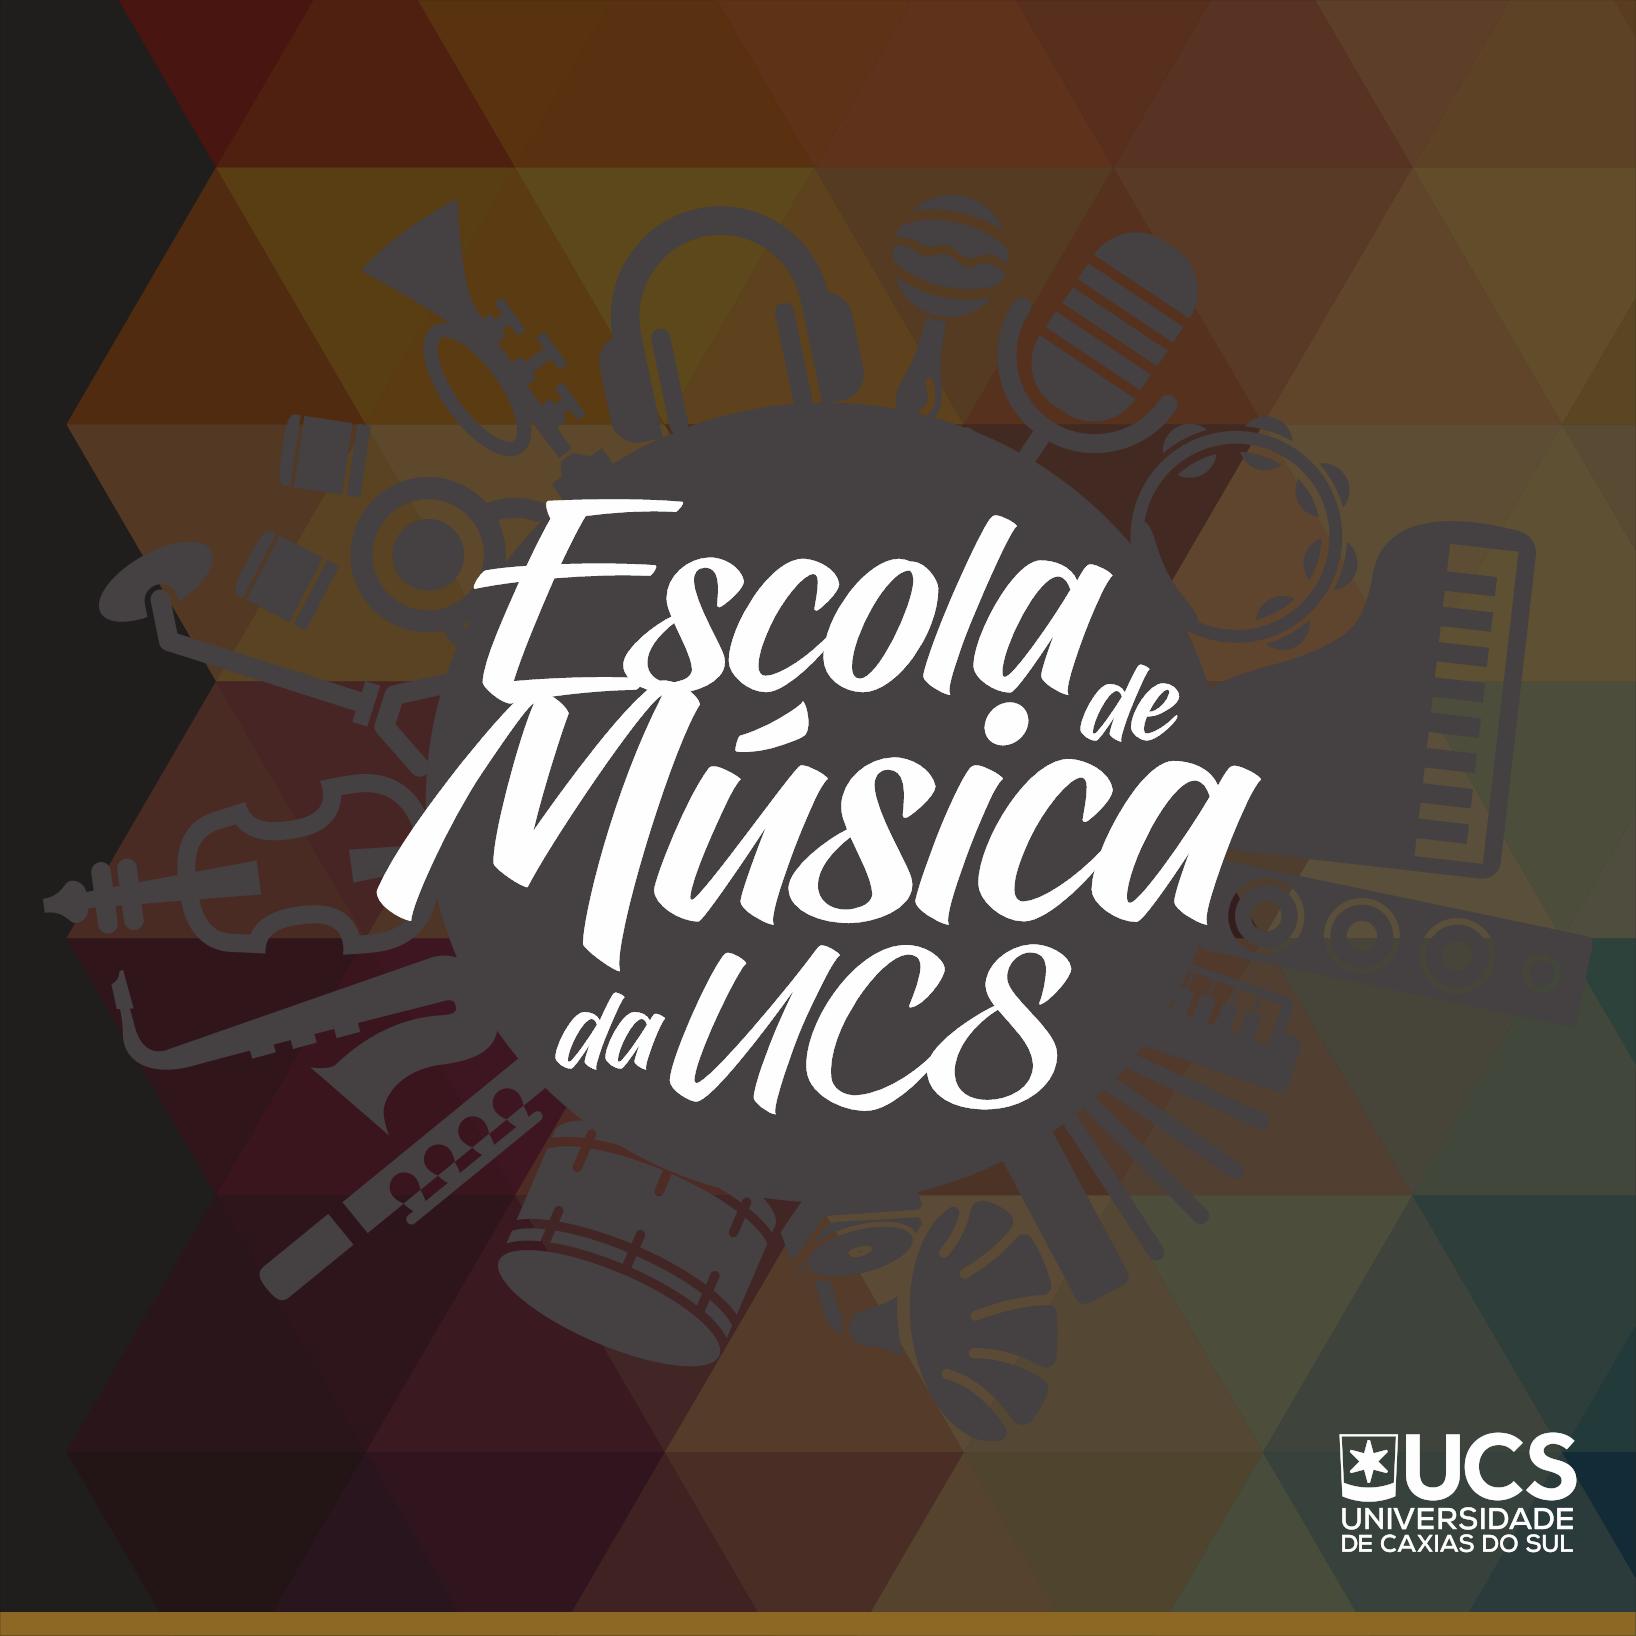 Escola de Música UCS - logo 2